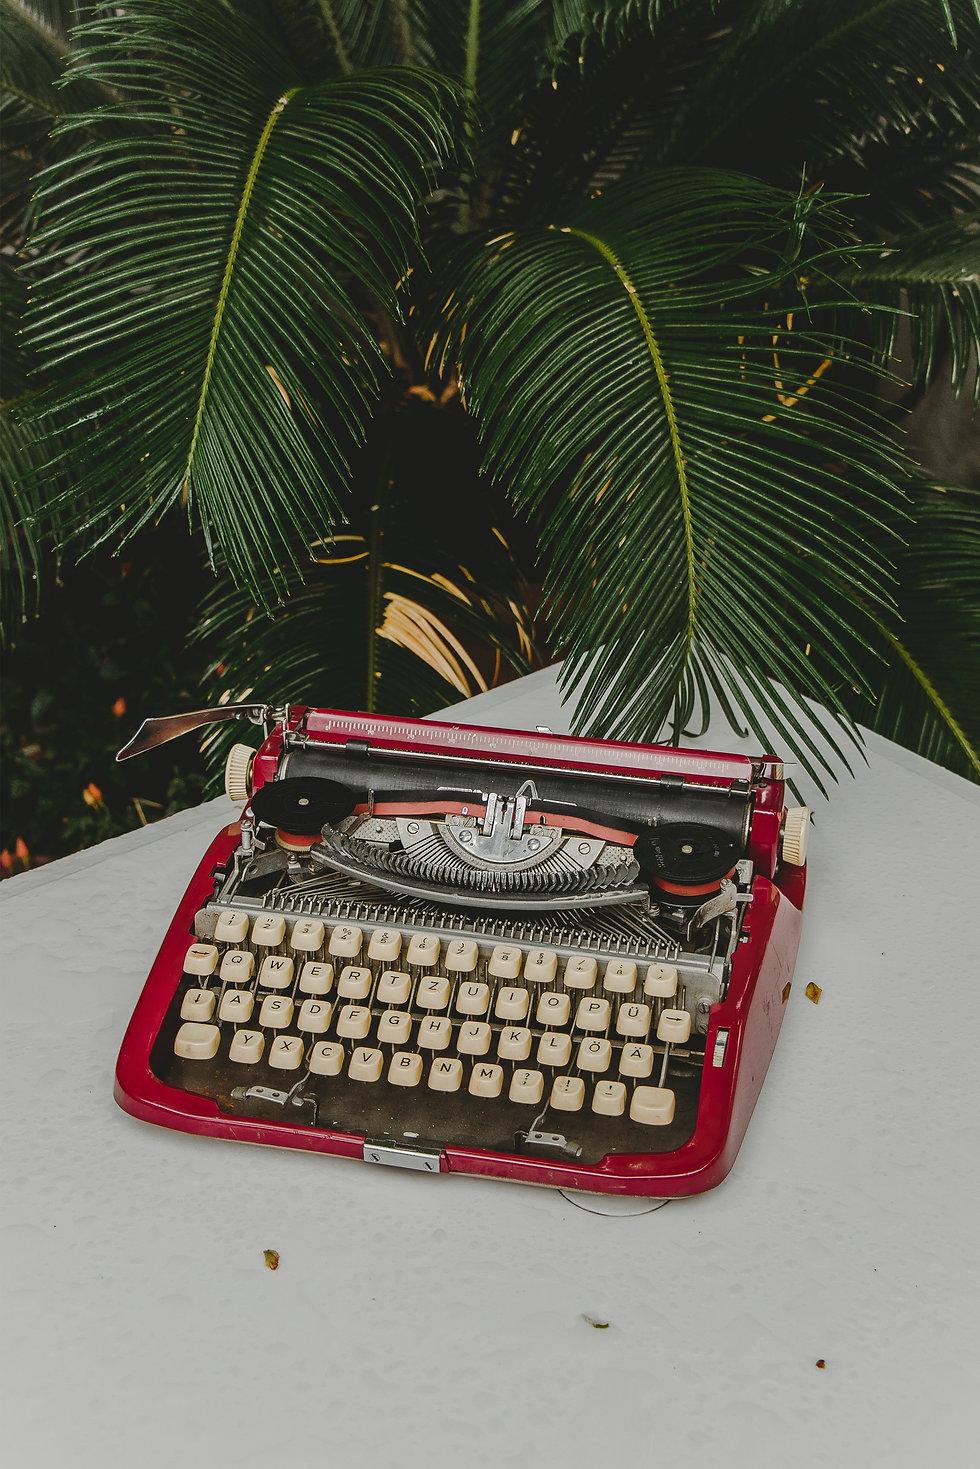 Typewriter infront of plant